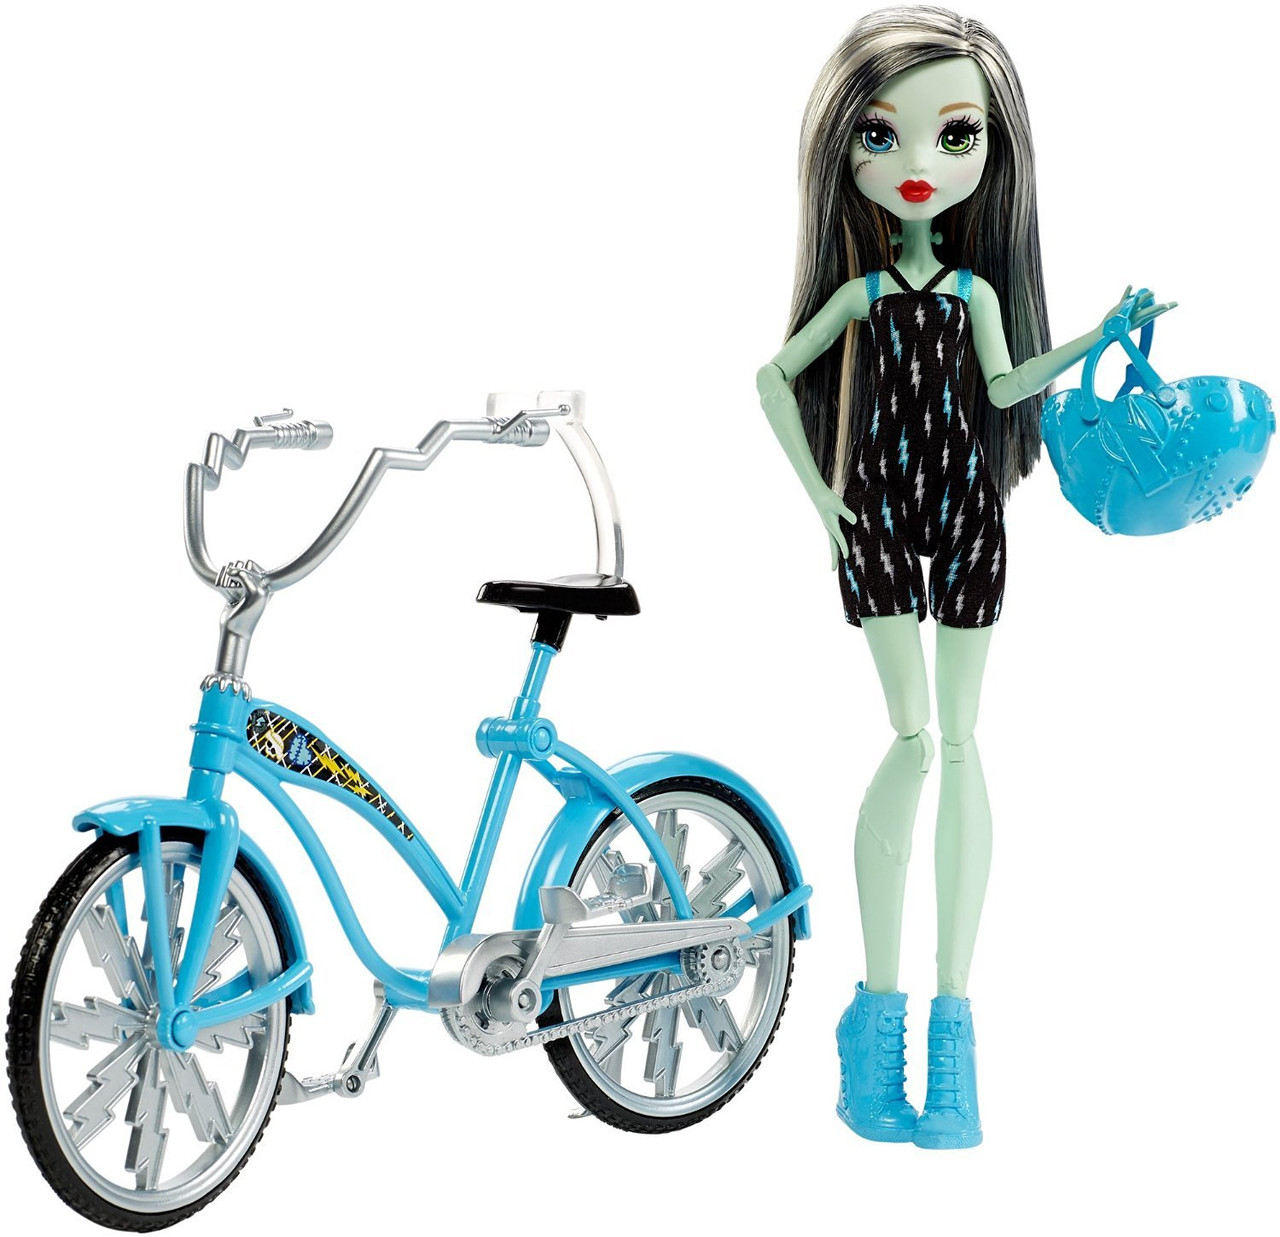 Monster High Фрэнки Штейн на велосипеде Boltin Bicycle Frankie Stein Doll Vehicle